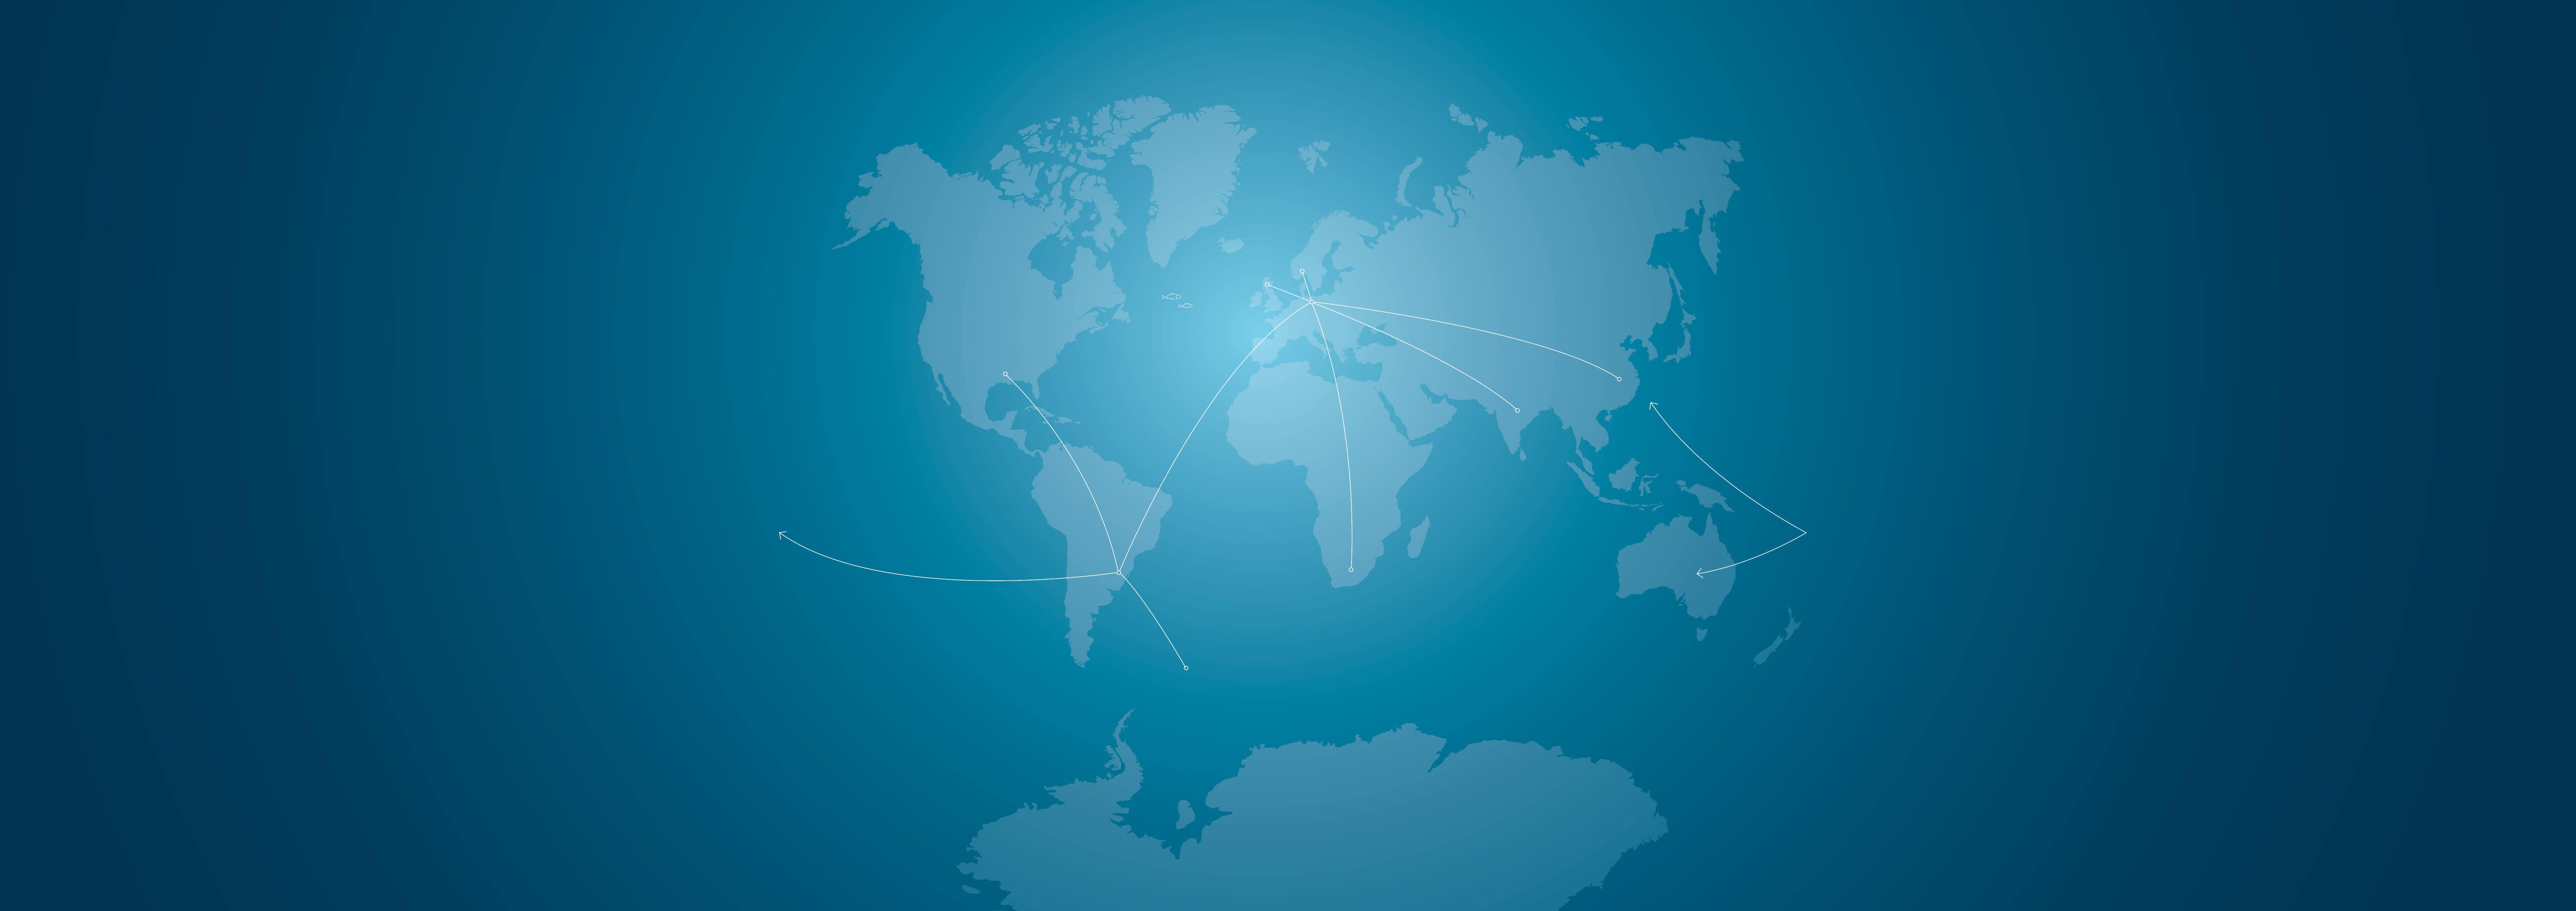 Superba-krill-traceability-World-map